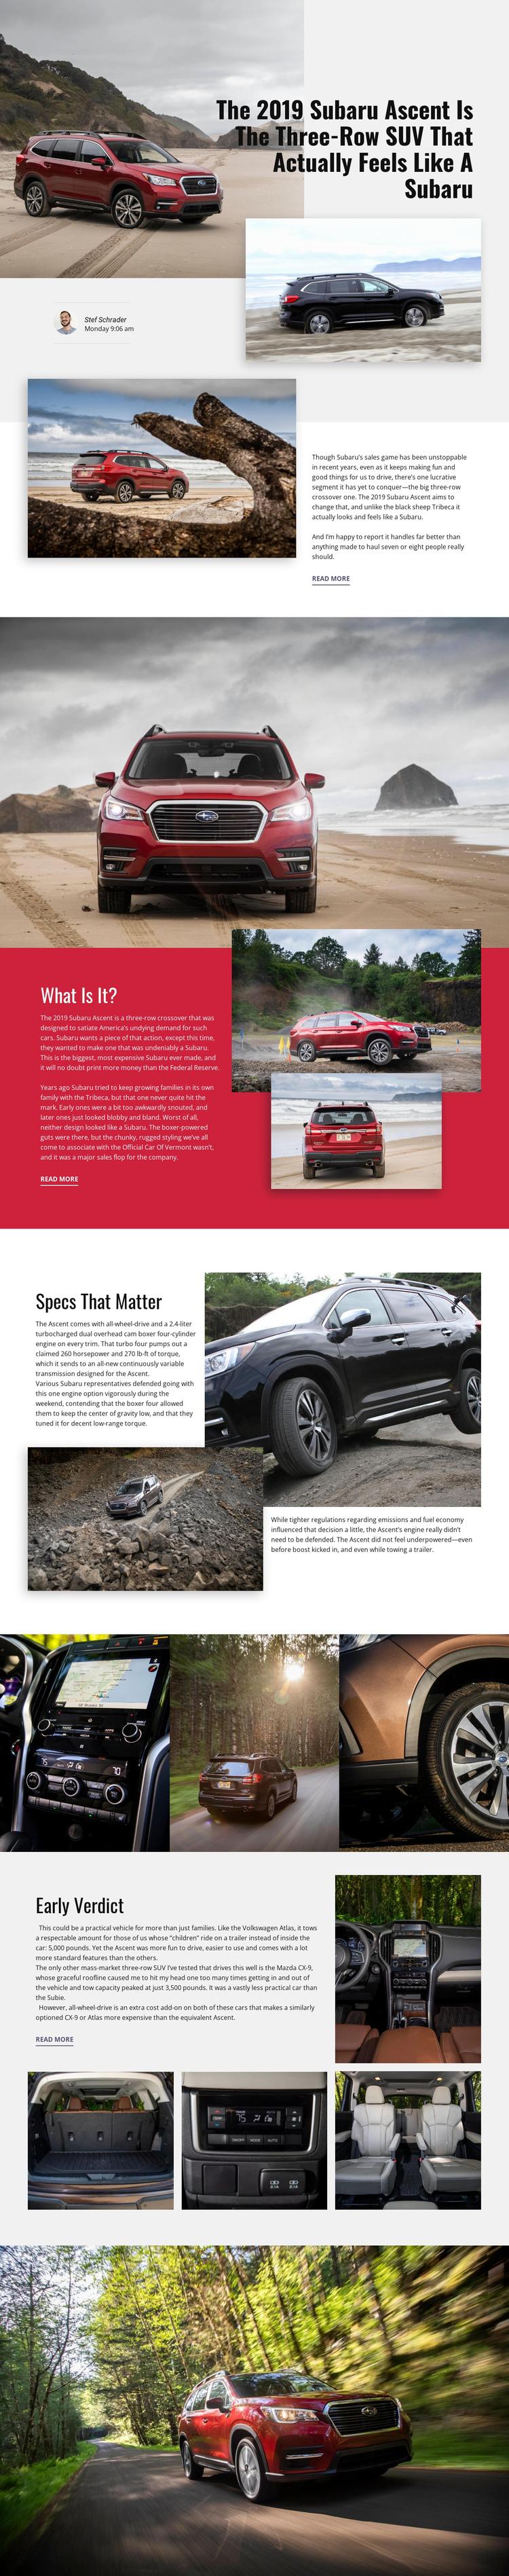 Subaru Website Builder Software